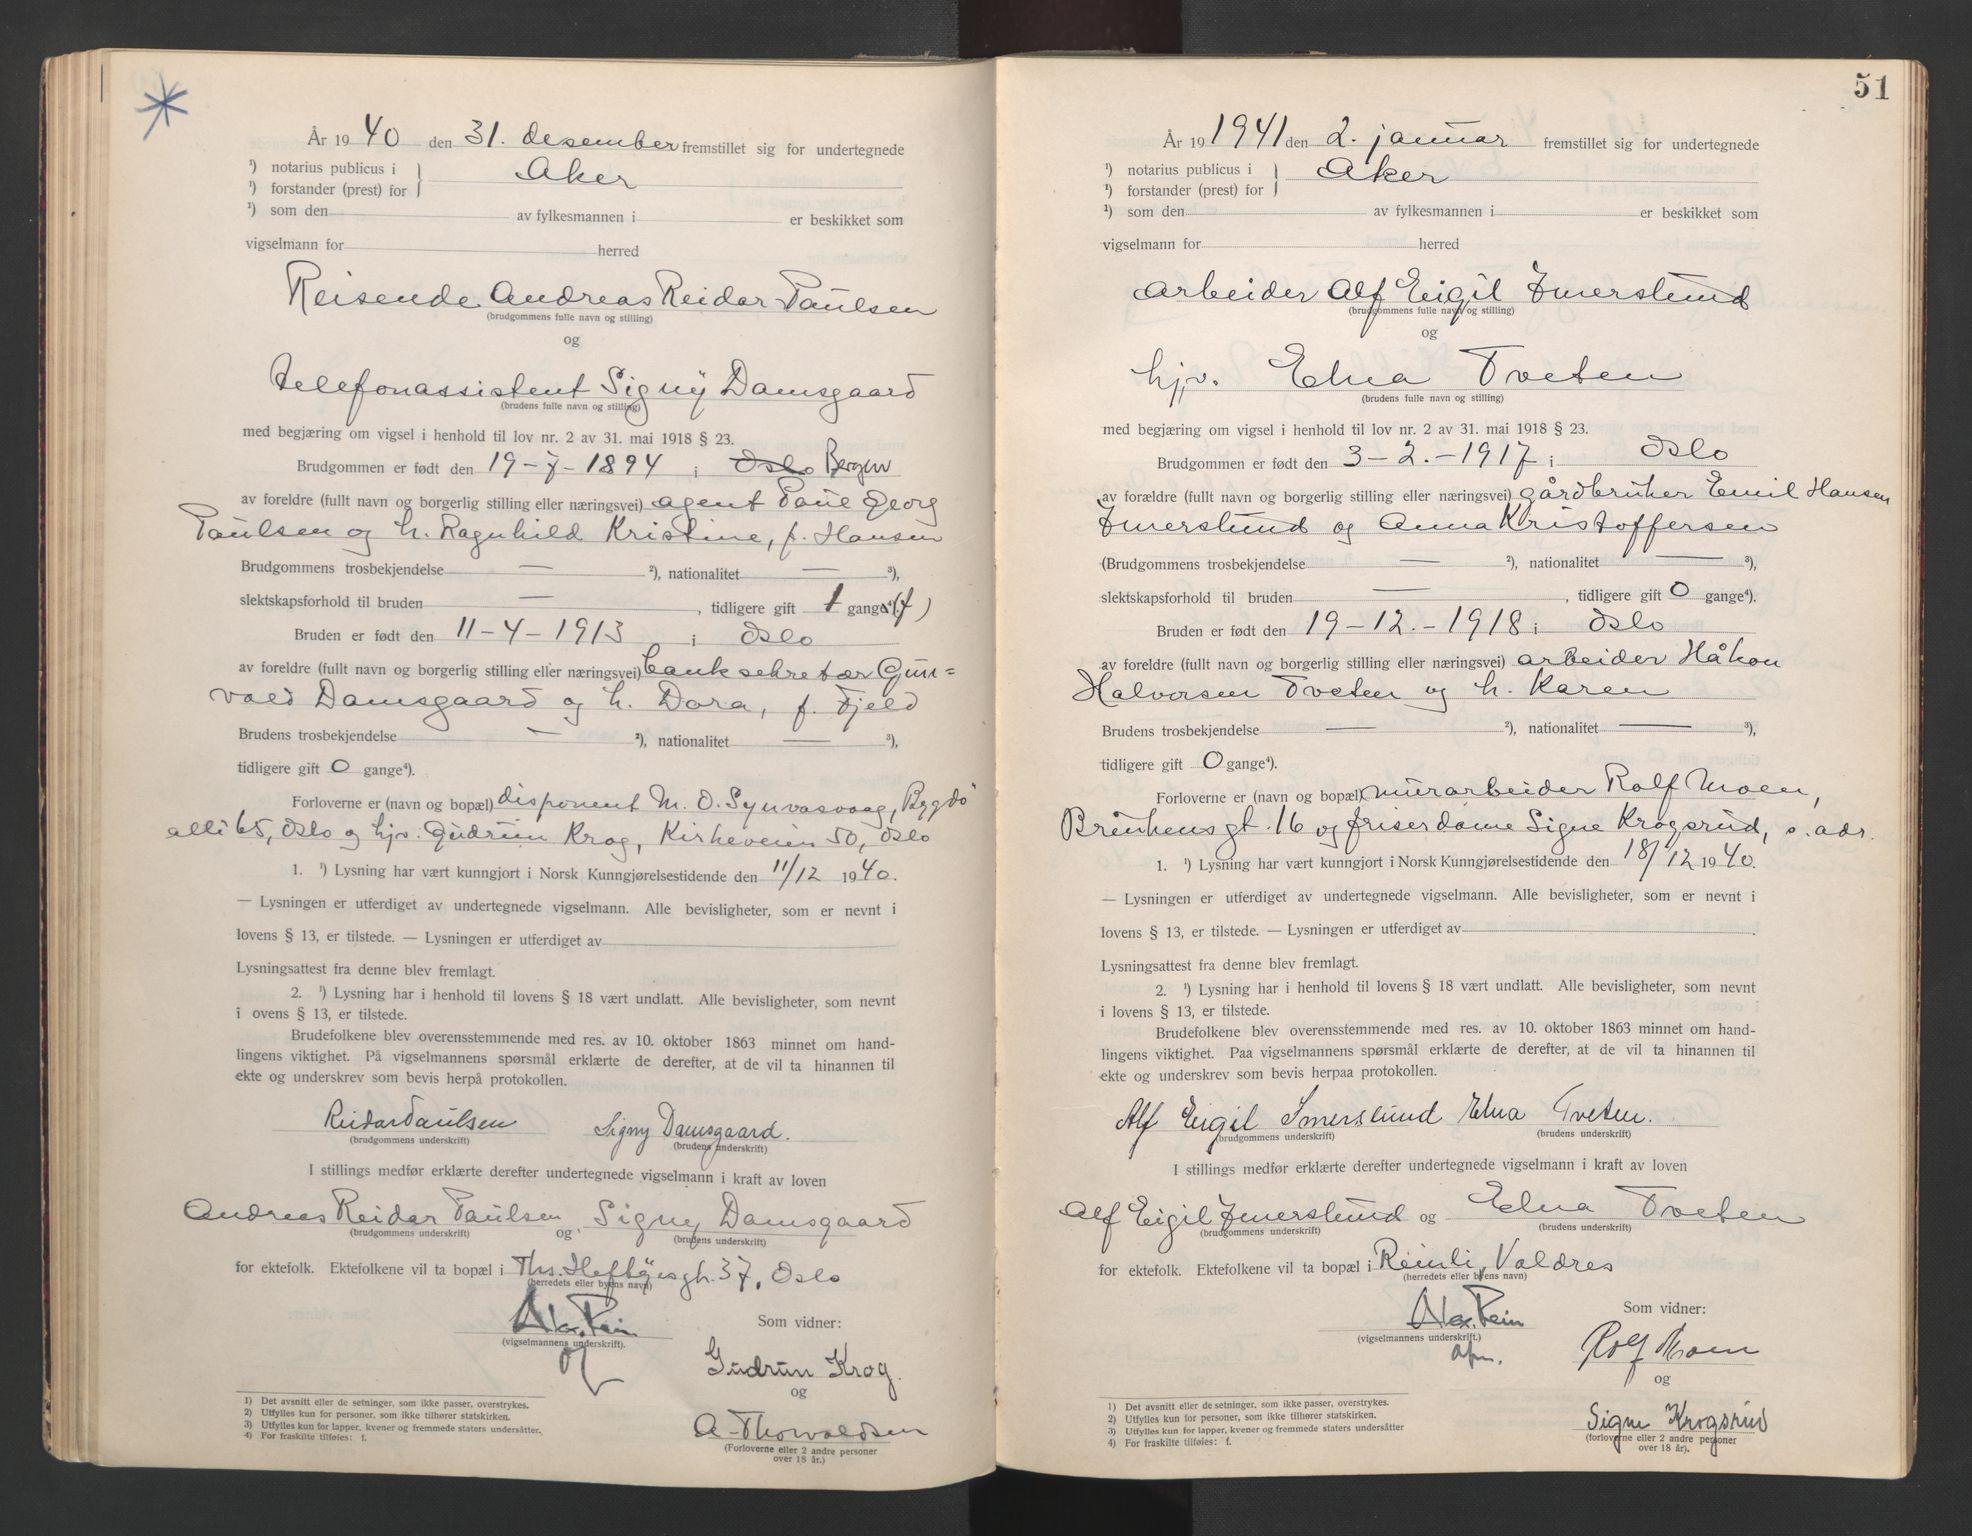 SAO, Aker sorenskriveri, L/Lc/Lcb/L0013: Vigselprotokoll, 1940-1941, s. 51